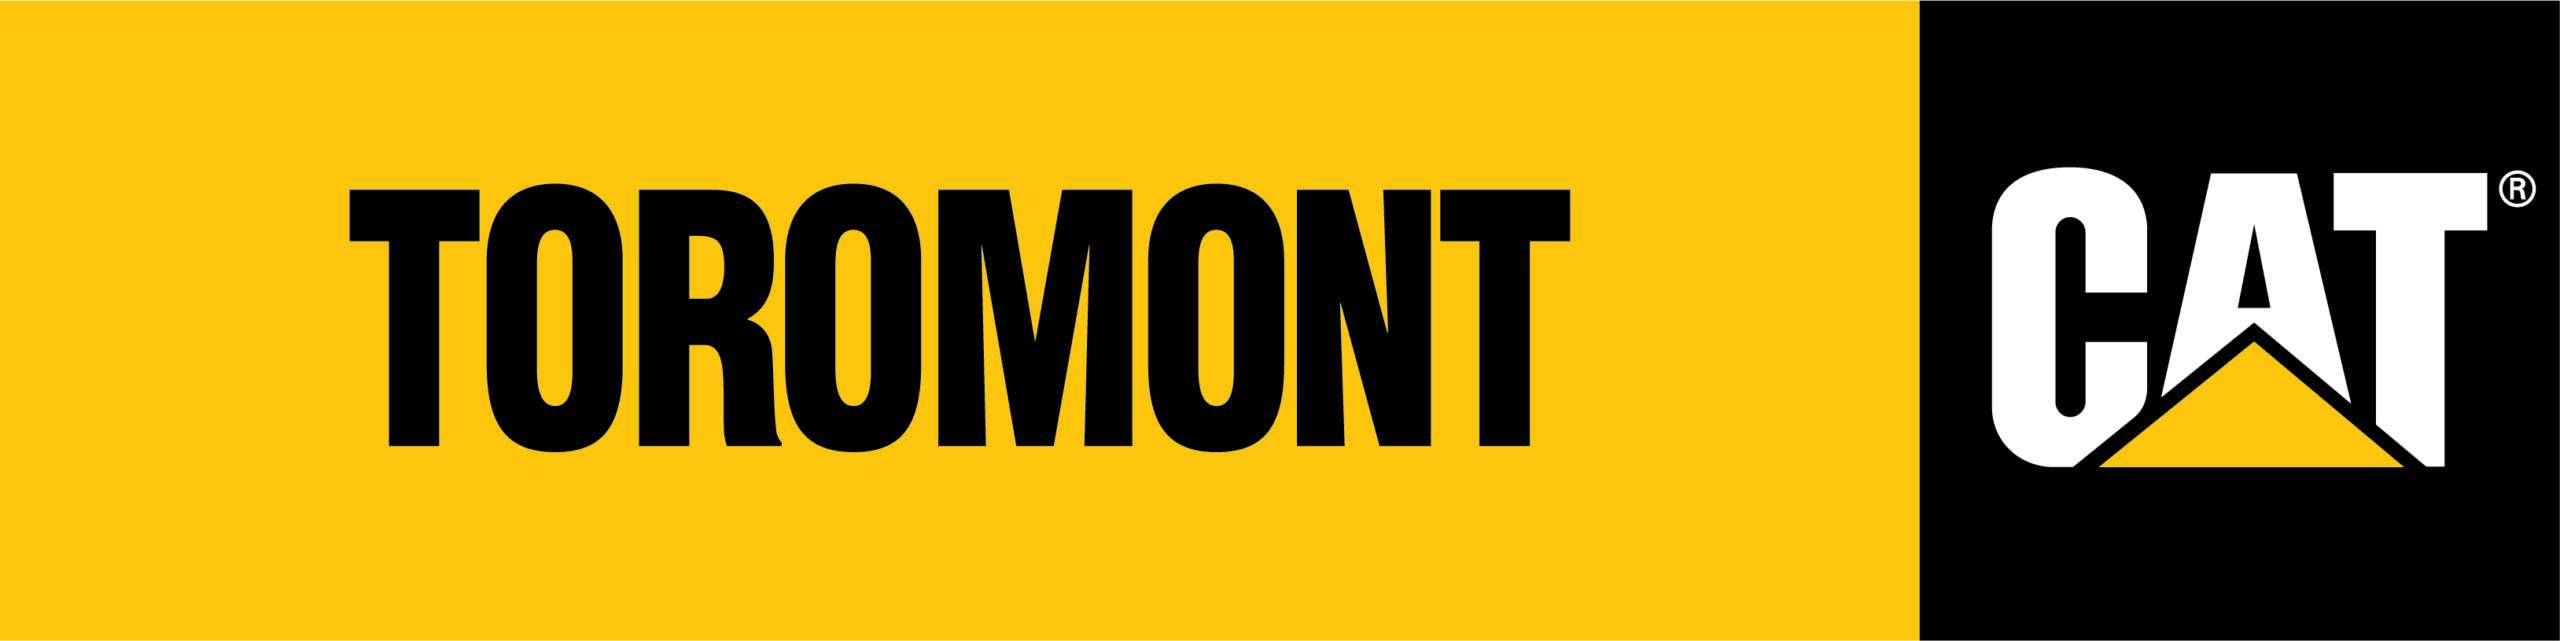 Toromont